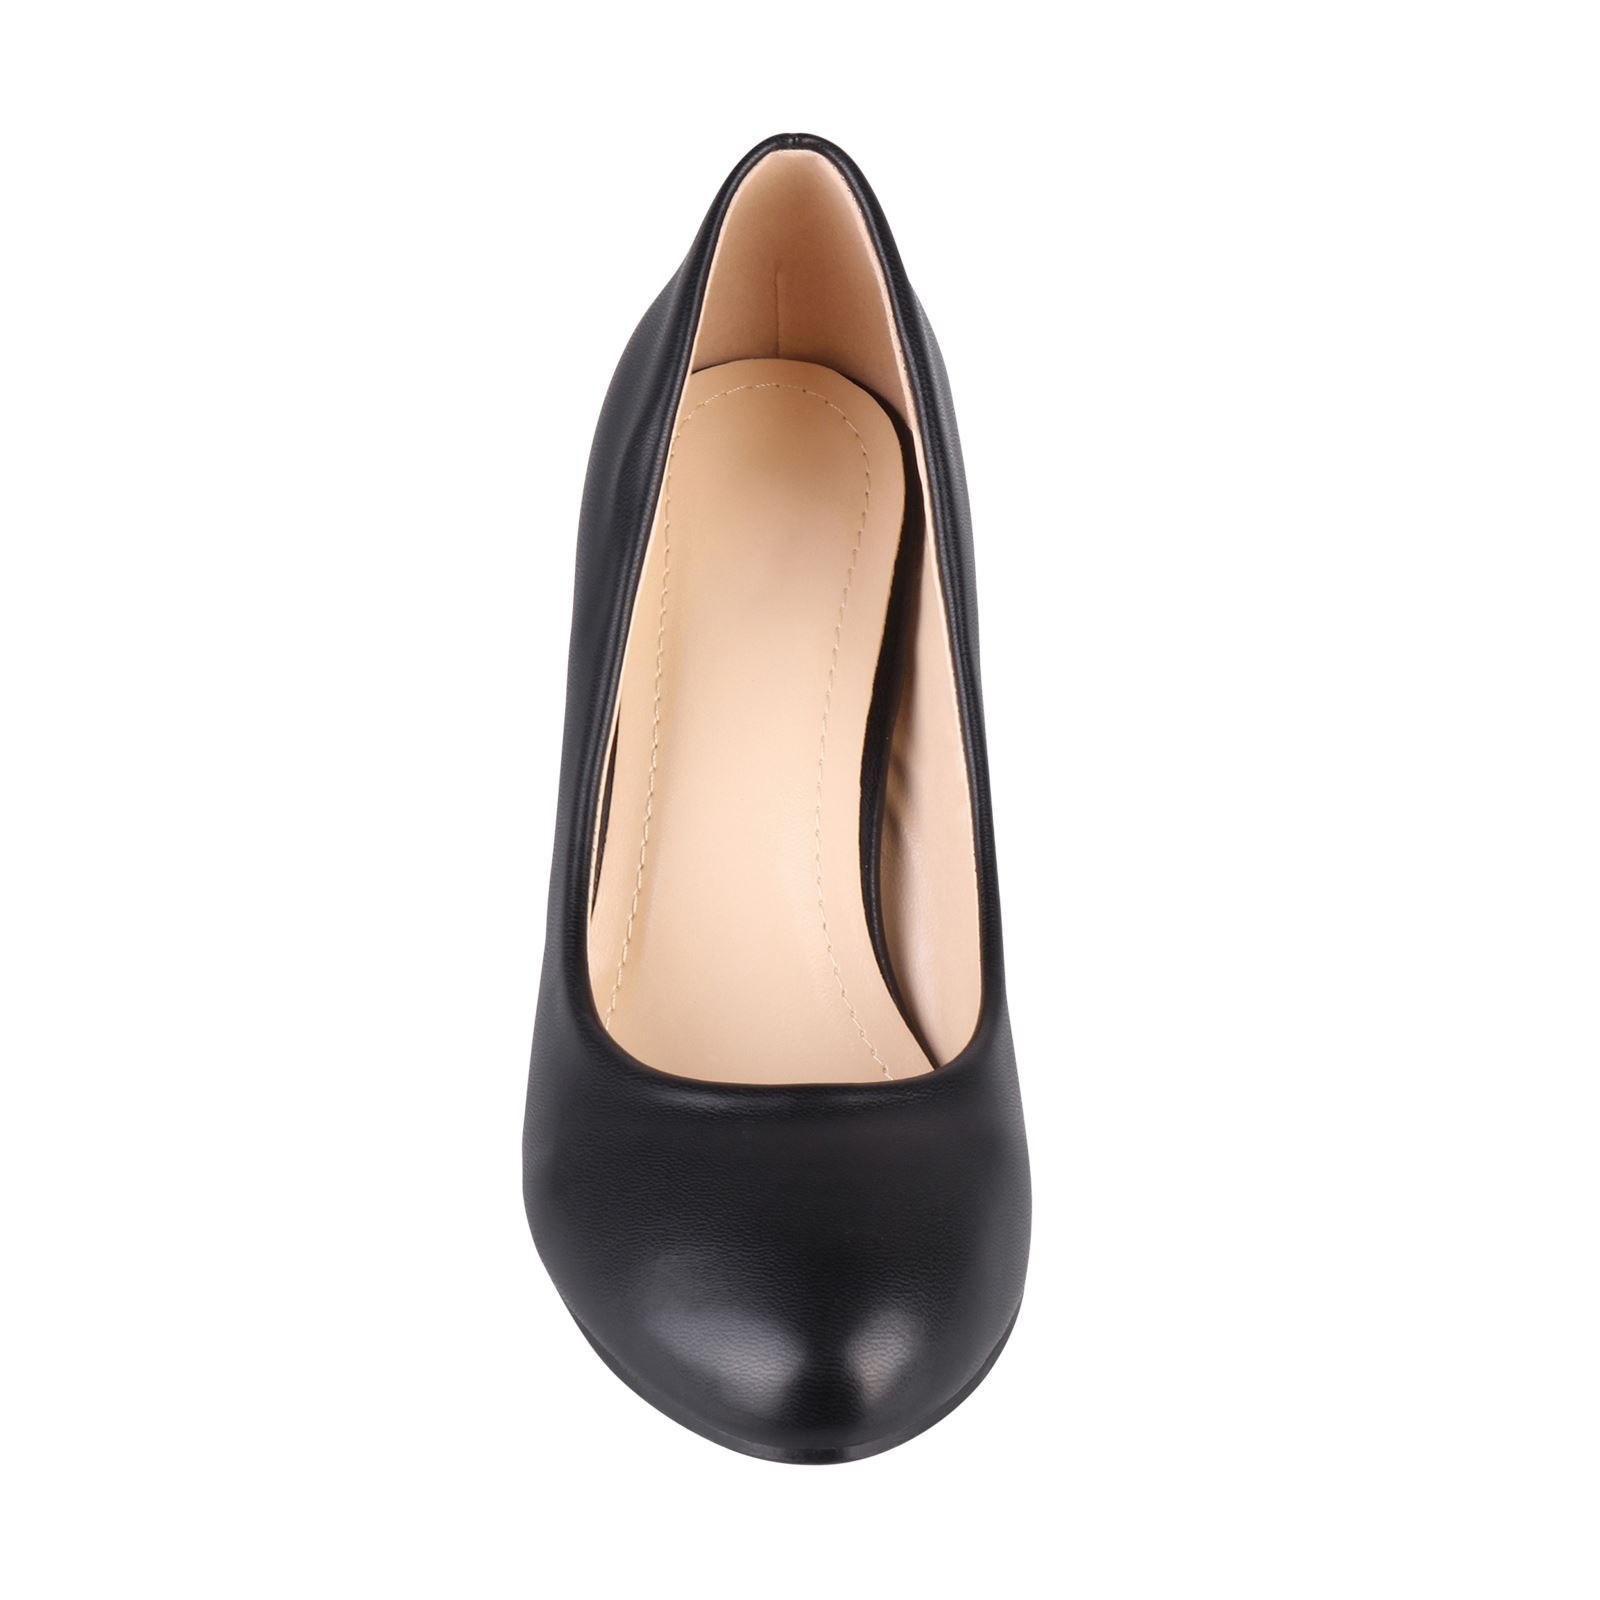 Womens-Ladies-Mid-Heel-Court-Shoes-Slip-On-Low-Kitten-Heels-Pumps-Matte-Size-3-8 thumbnail 8